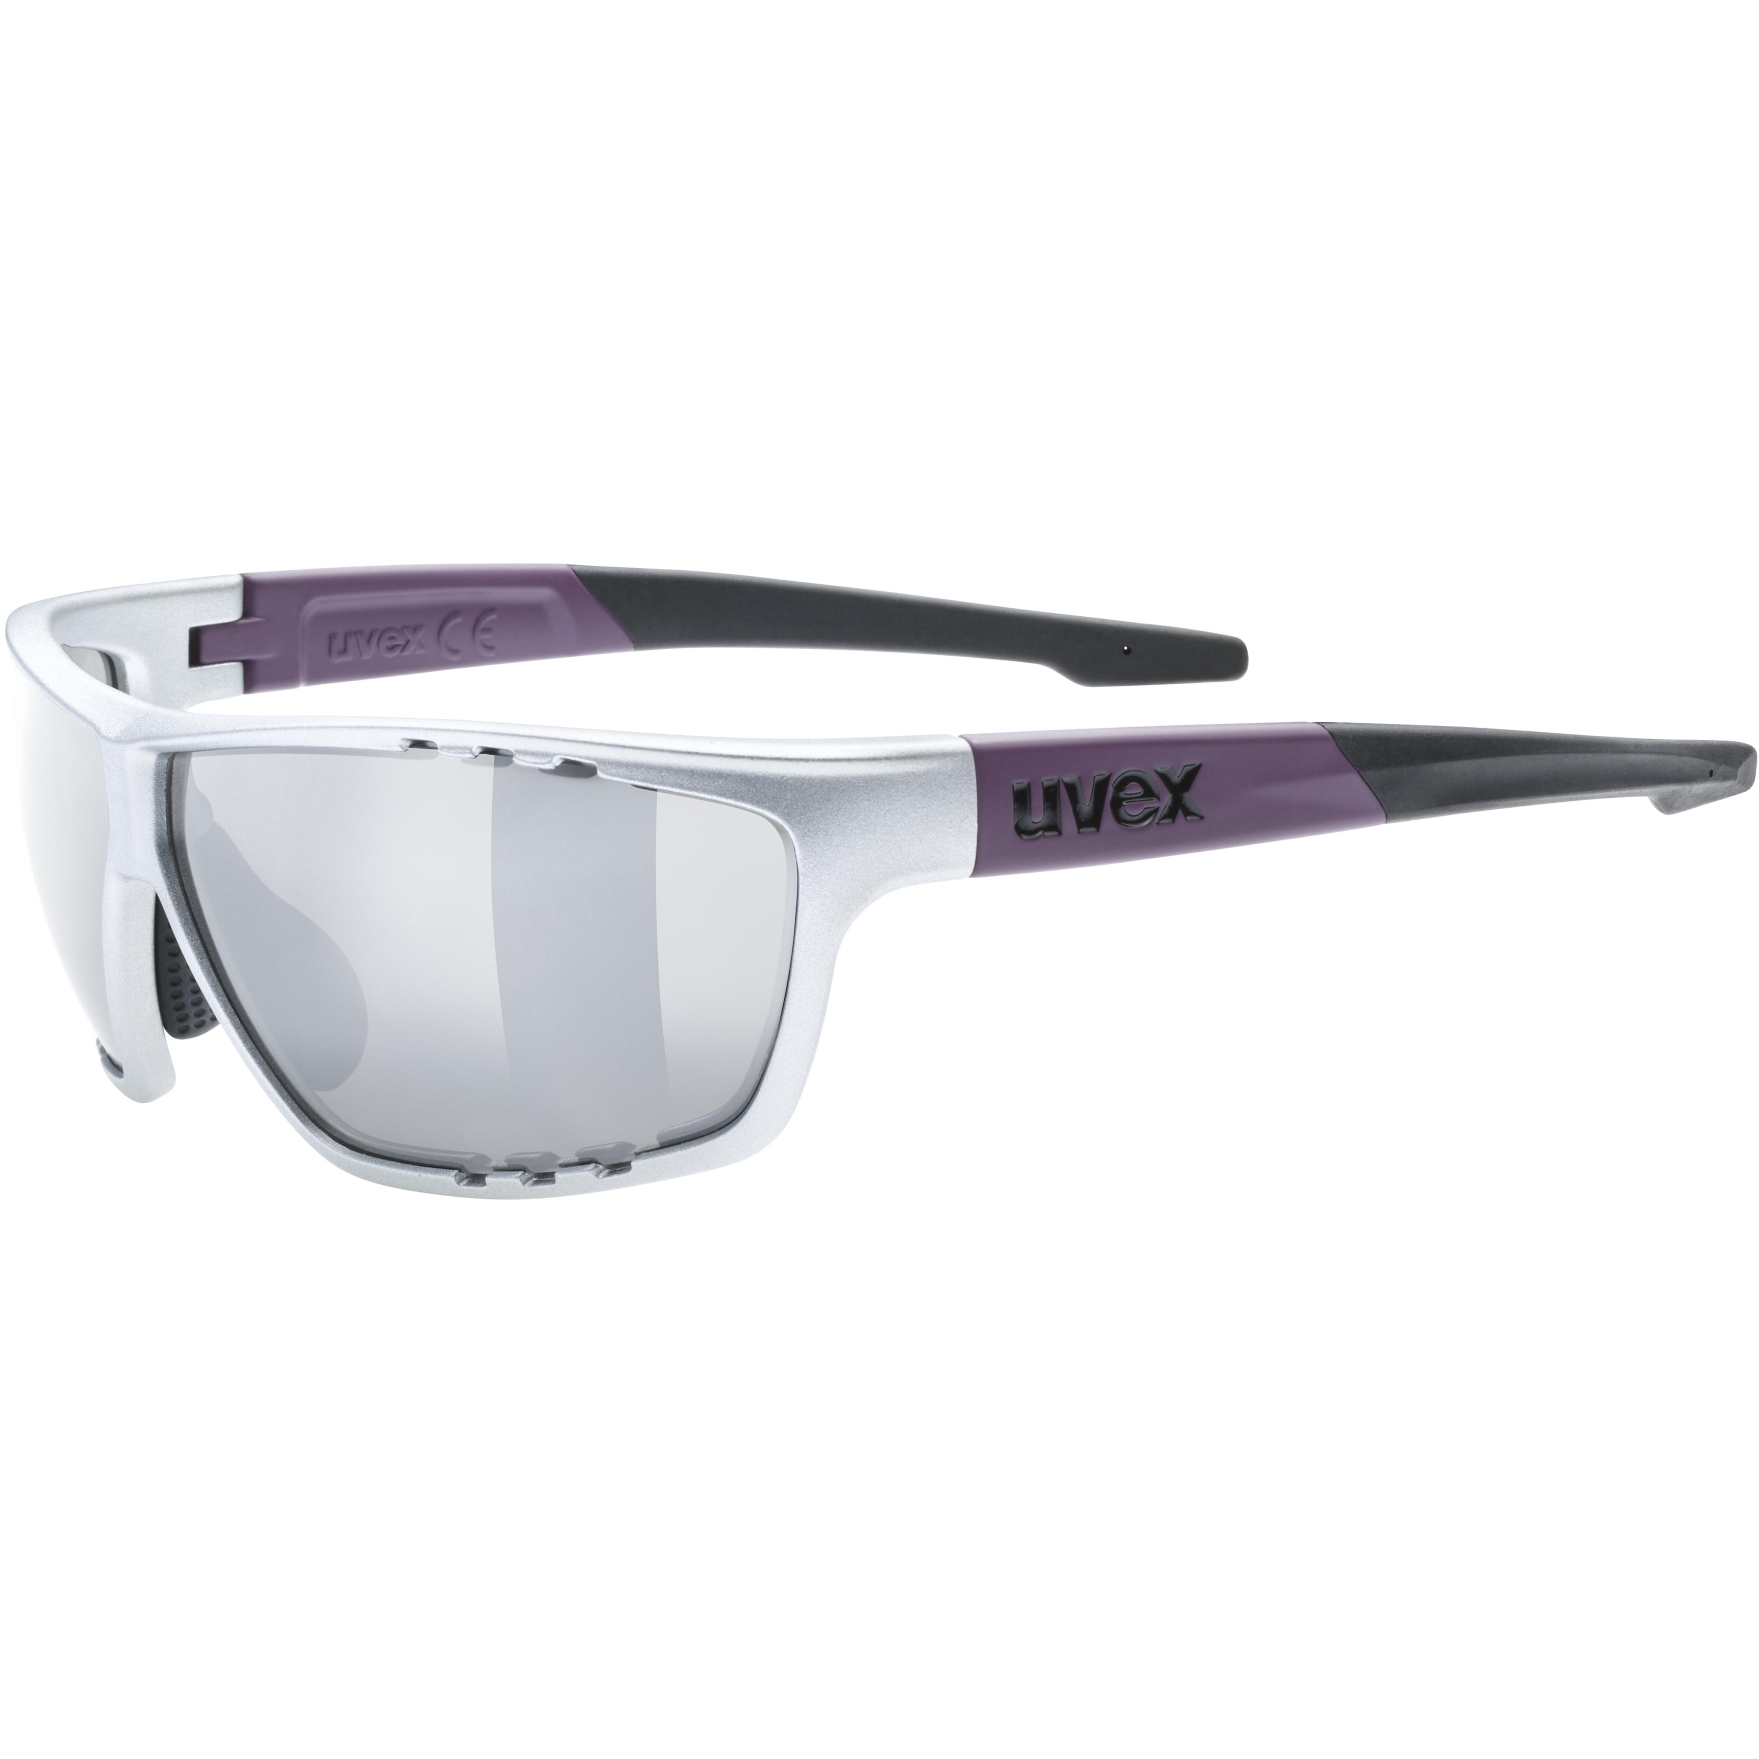 Uvex sportstyle 706 Glasses - silver plum mat/litemirror silver